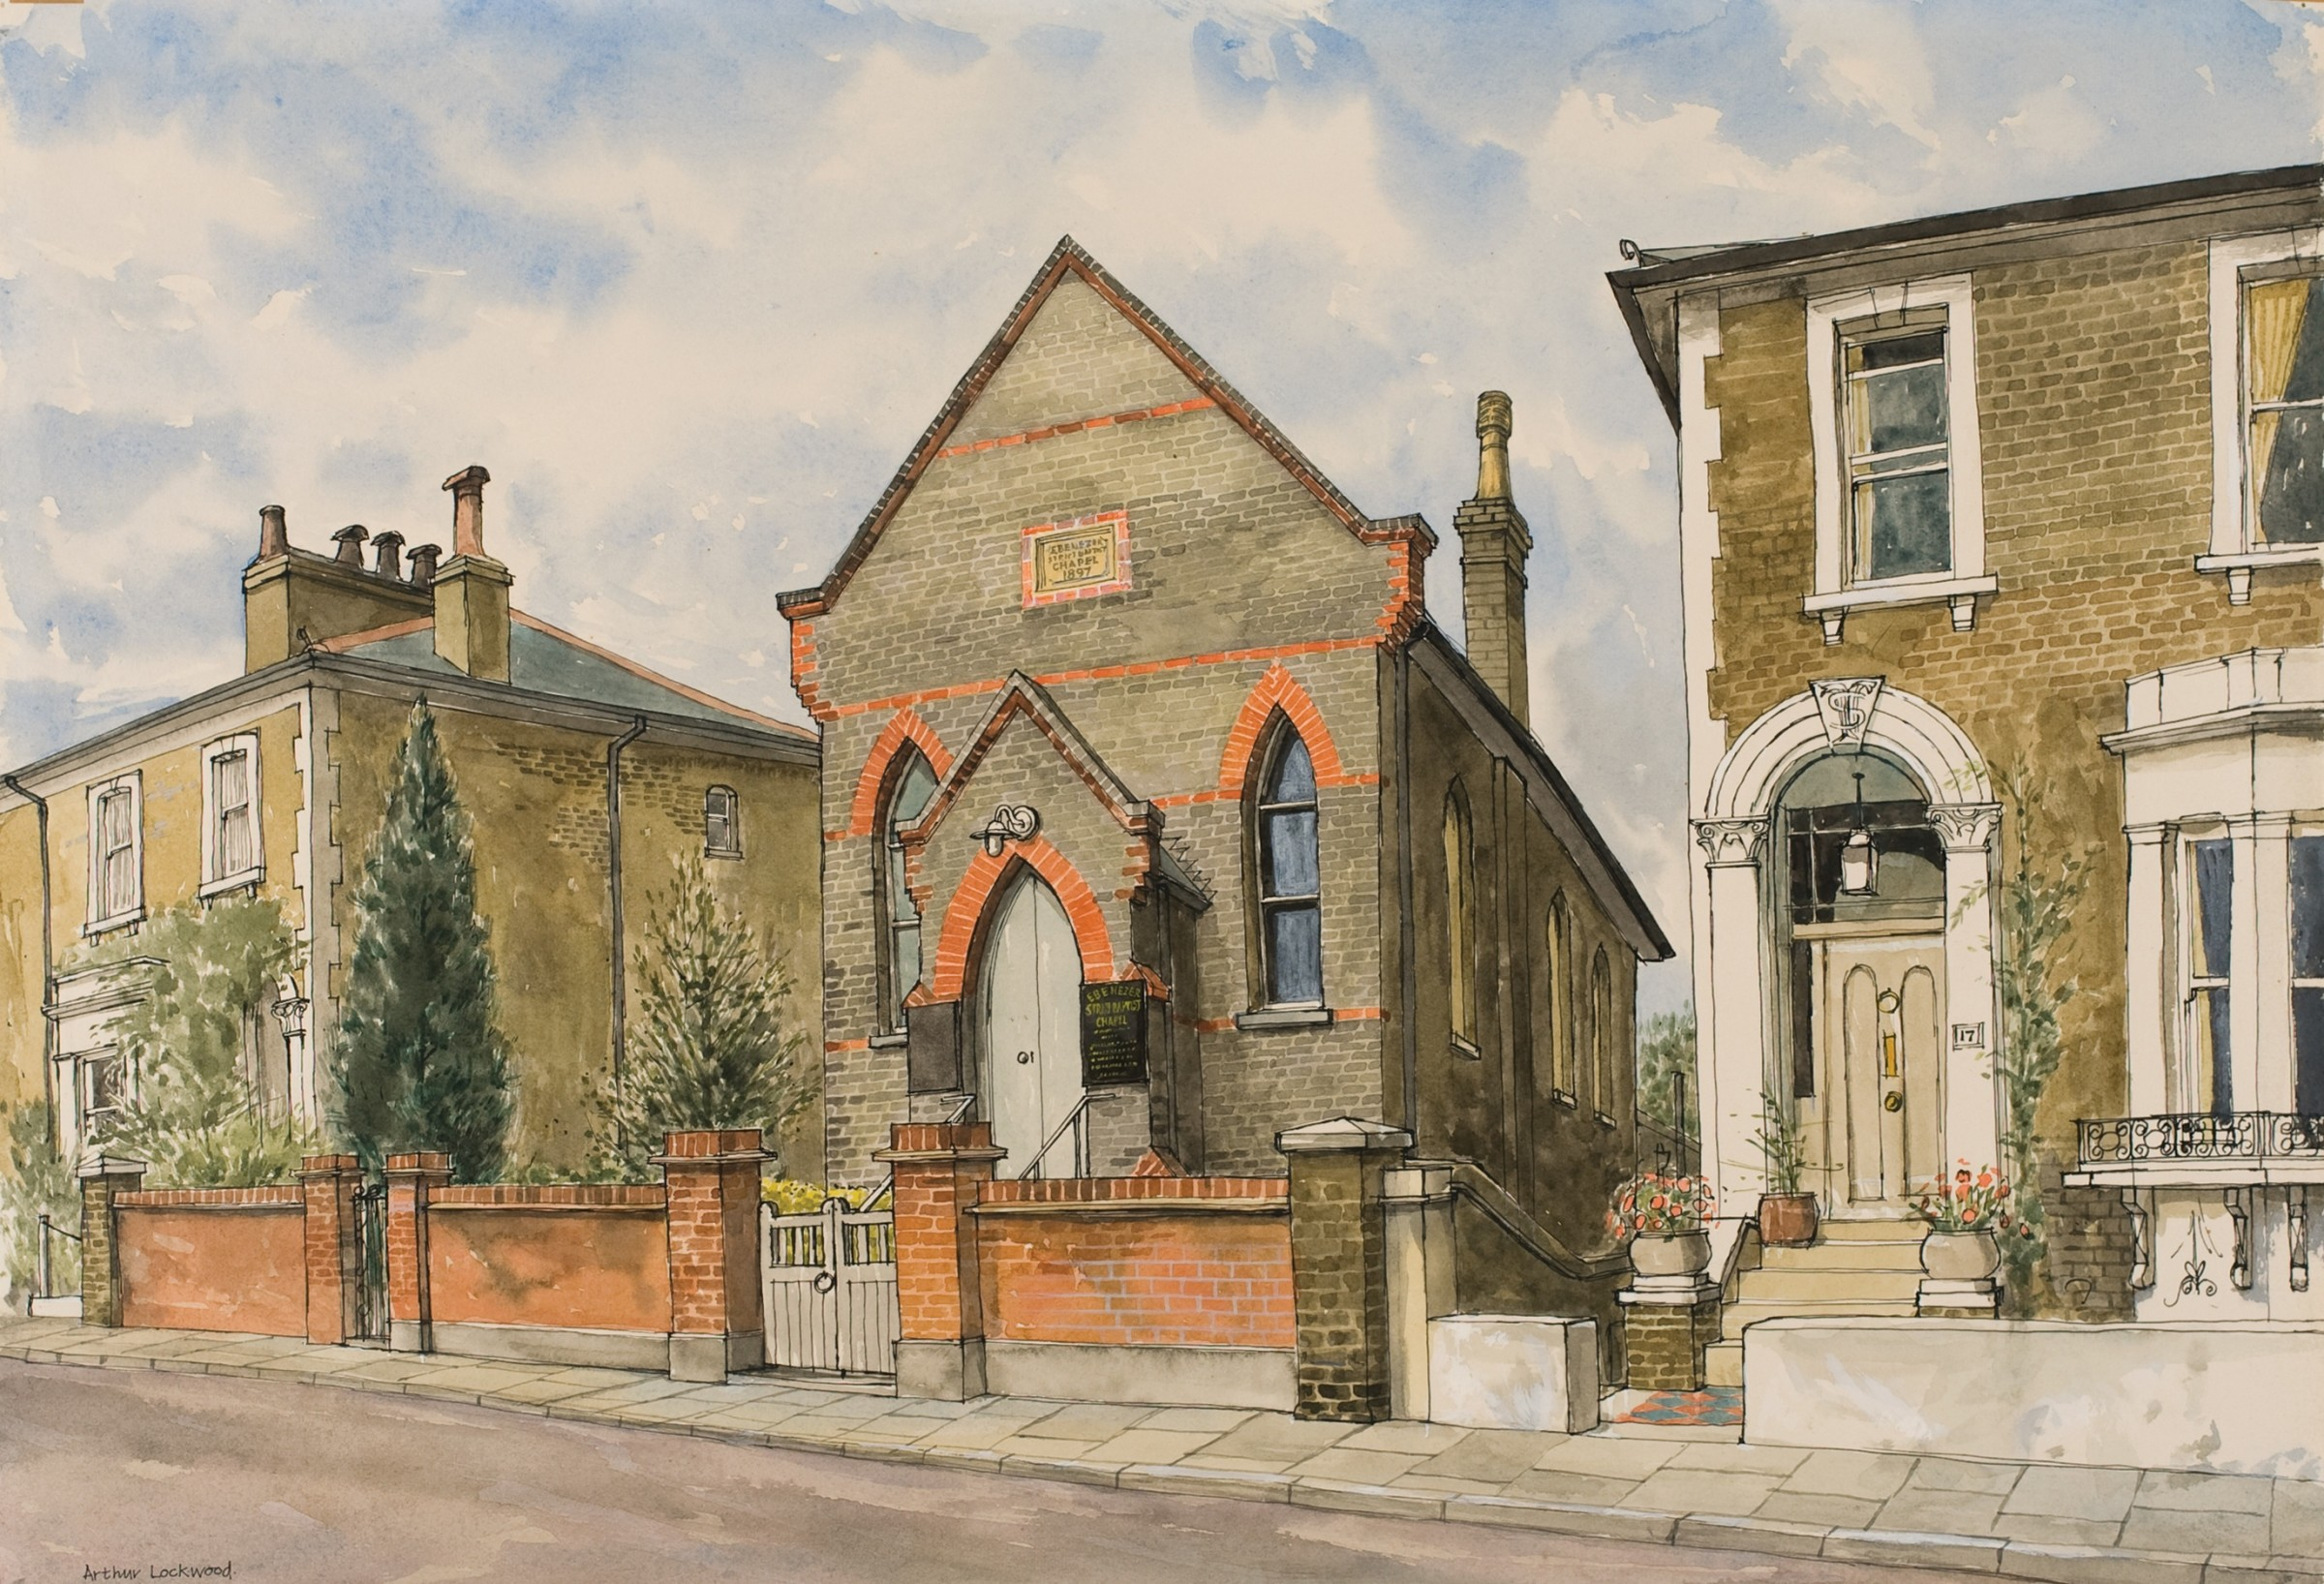 <span class=&#34;link fancybox-details-link&#34;><a href=&#34;/artists/79-arthur-lockwood/works/9996-arthur-lockwood-ebenezer-strict-baptist-chapel-richmond/&#34;>View Detail Page</a></span><div class=&#34;artist&#34;><span class=&#34;artist&#34;><strong>Arthur Lockwood</strong></span></div><div class=&#34;title&#34;><em>Ebenezer Strict Baptist Chapel, Richmond</em></div><div class=&#34;medium&#34;>pen & wash</div><div class=&#34;price&#34;>£550.00</div>